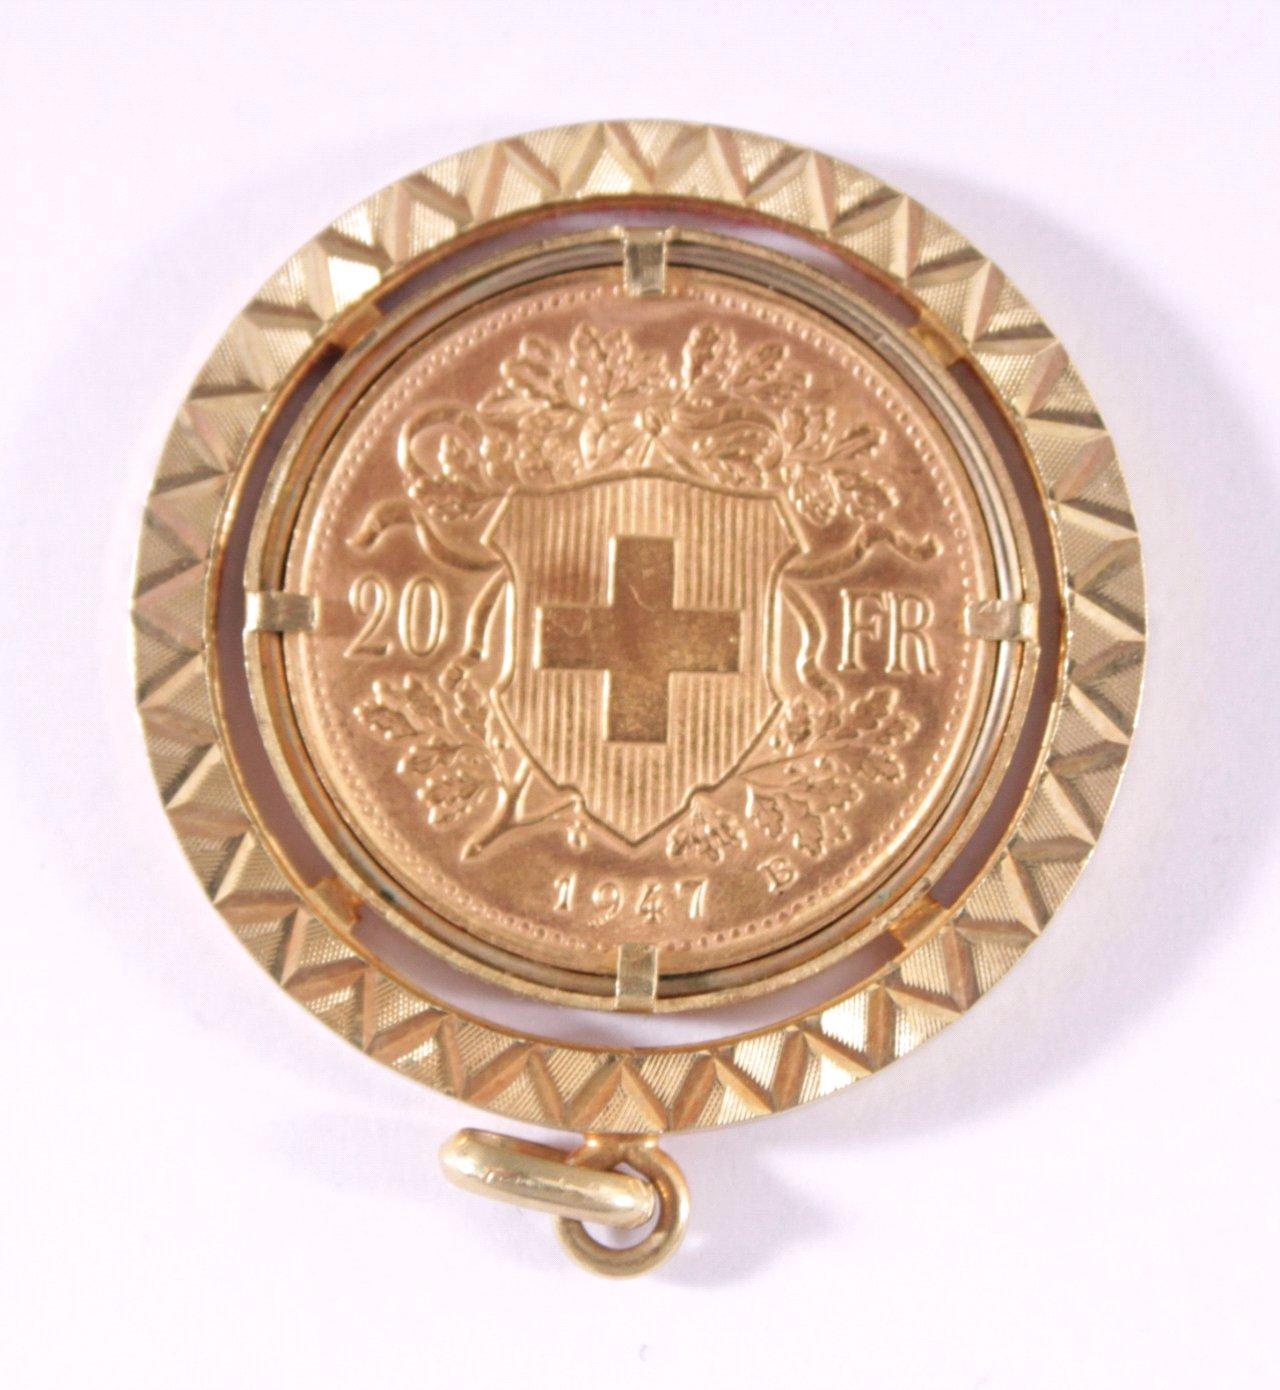 Anhänger mit Münze, Vreneli 20 Franken Gold v. 1947 B-1